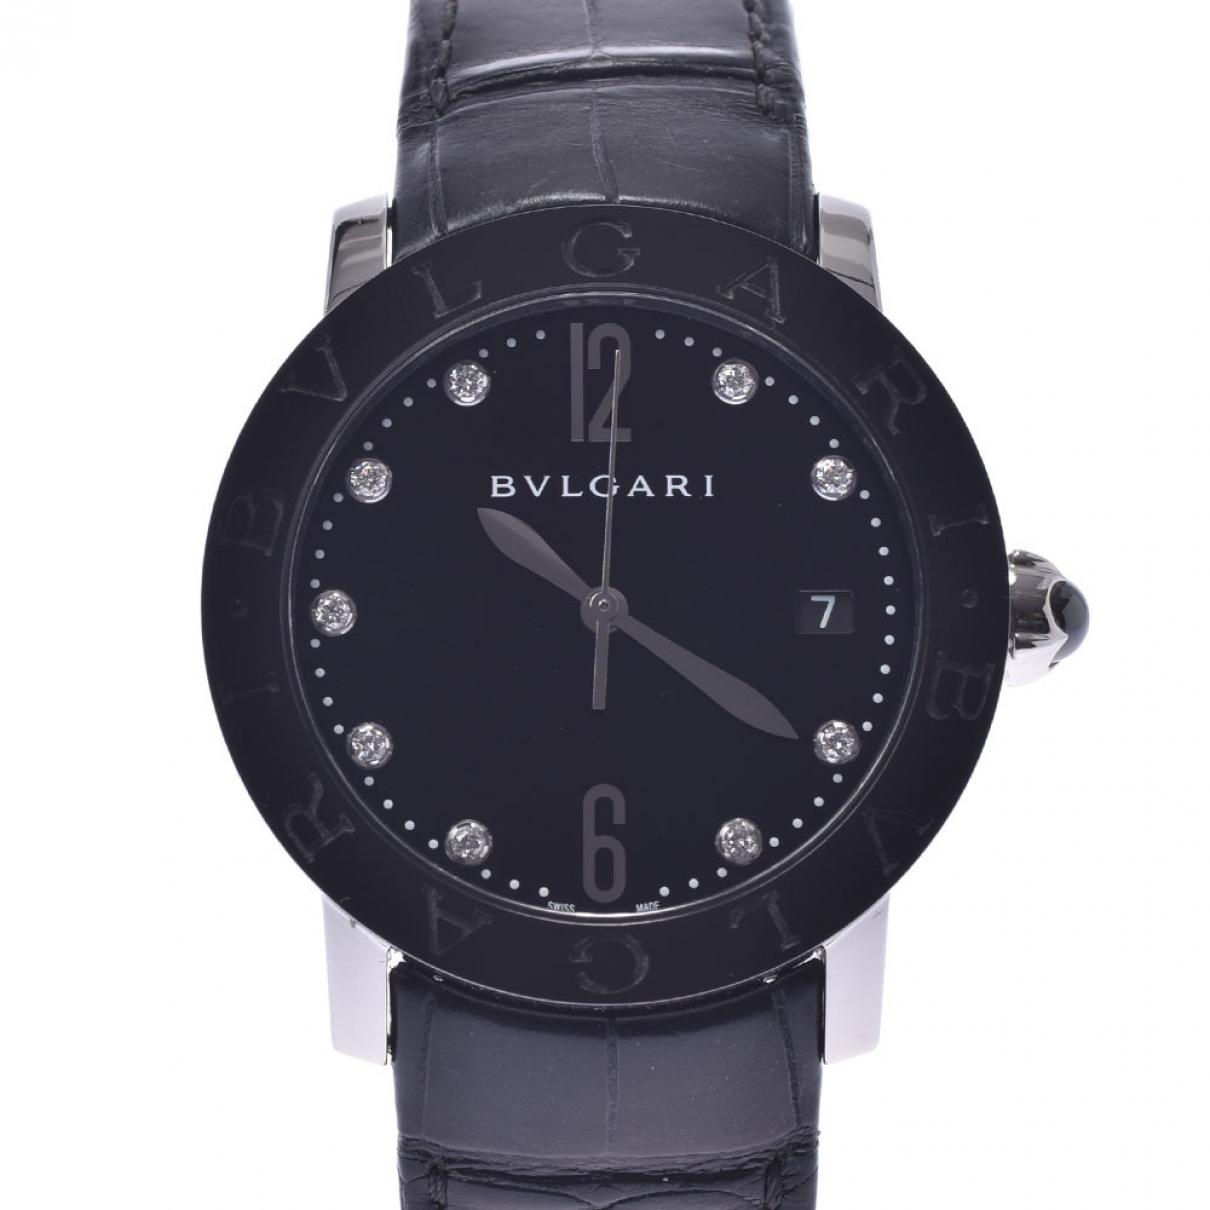 Bvlgari - Montre Bulgari Bulgari pour homme en acier - noir